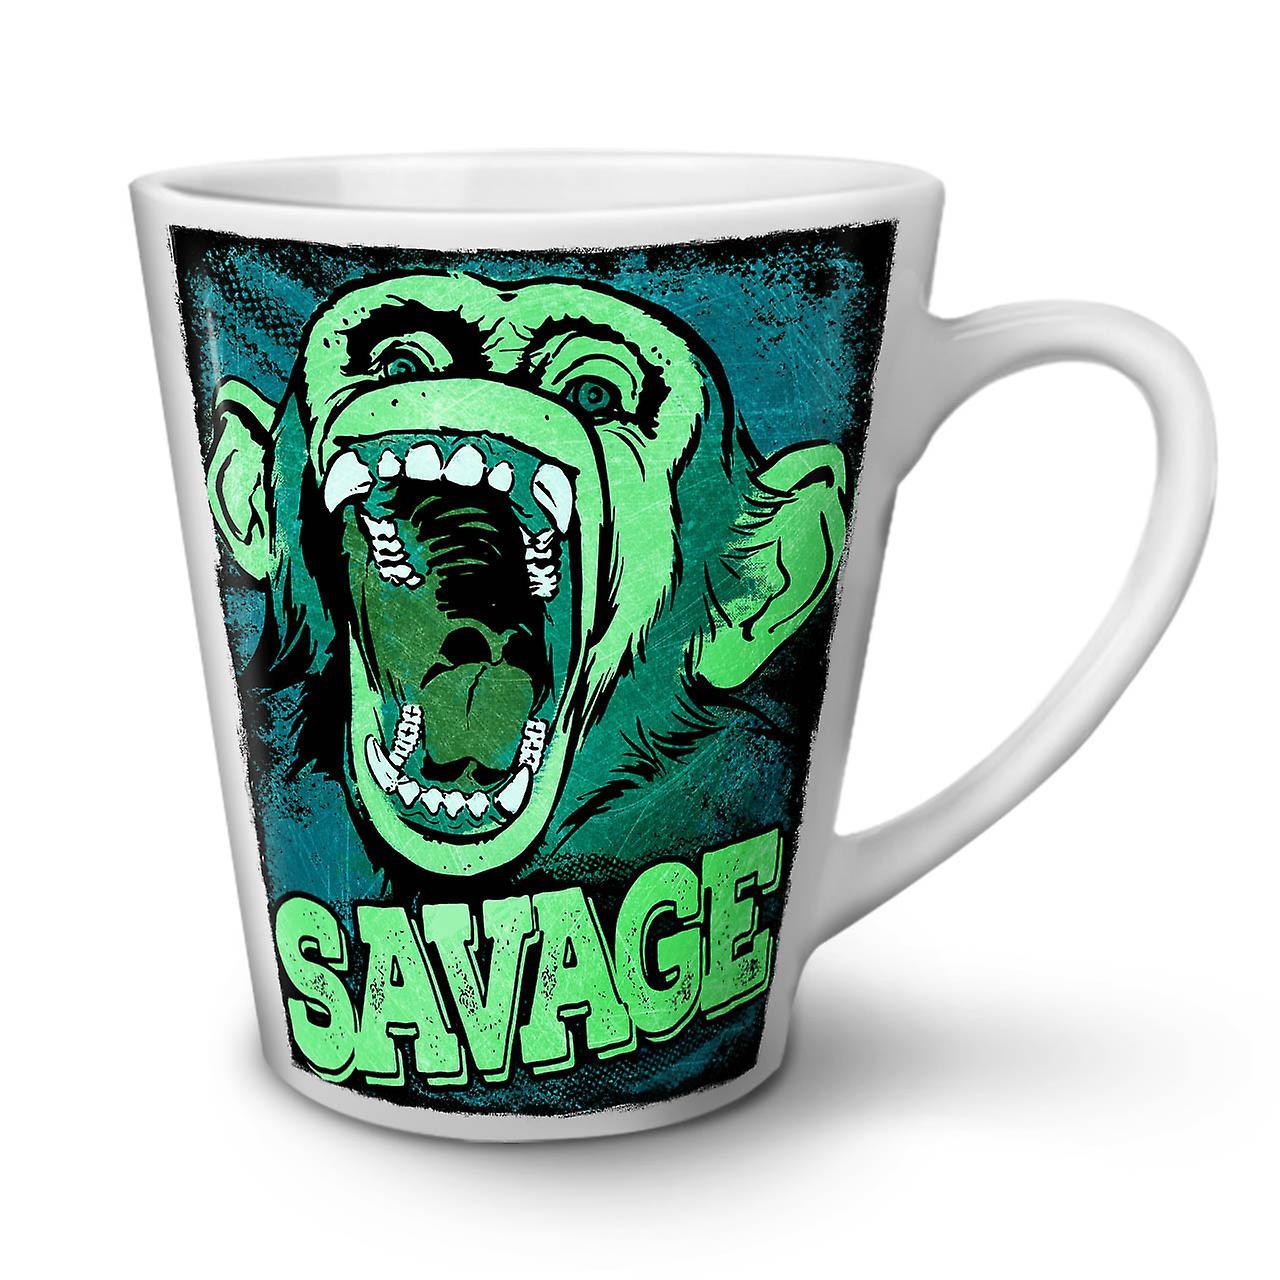 Singe Blanc En OzWellcoda Nouveau Drôle Mug Thé Savage Latte Céramique 12 Café KulFJTc13